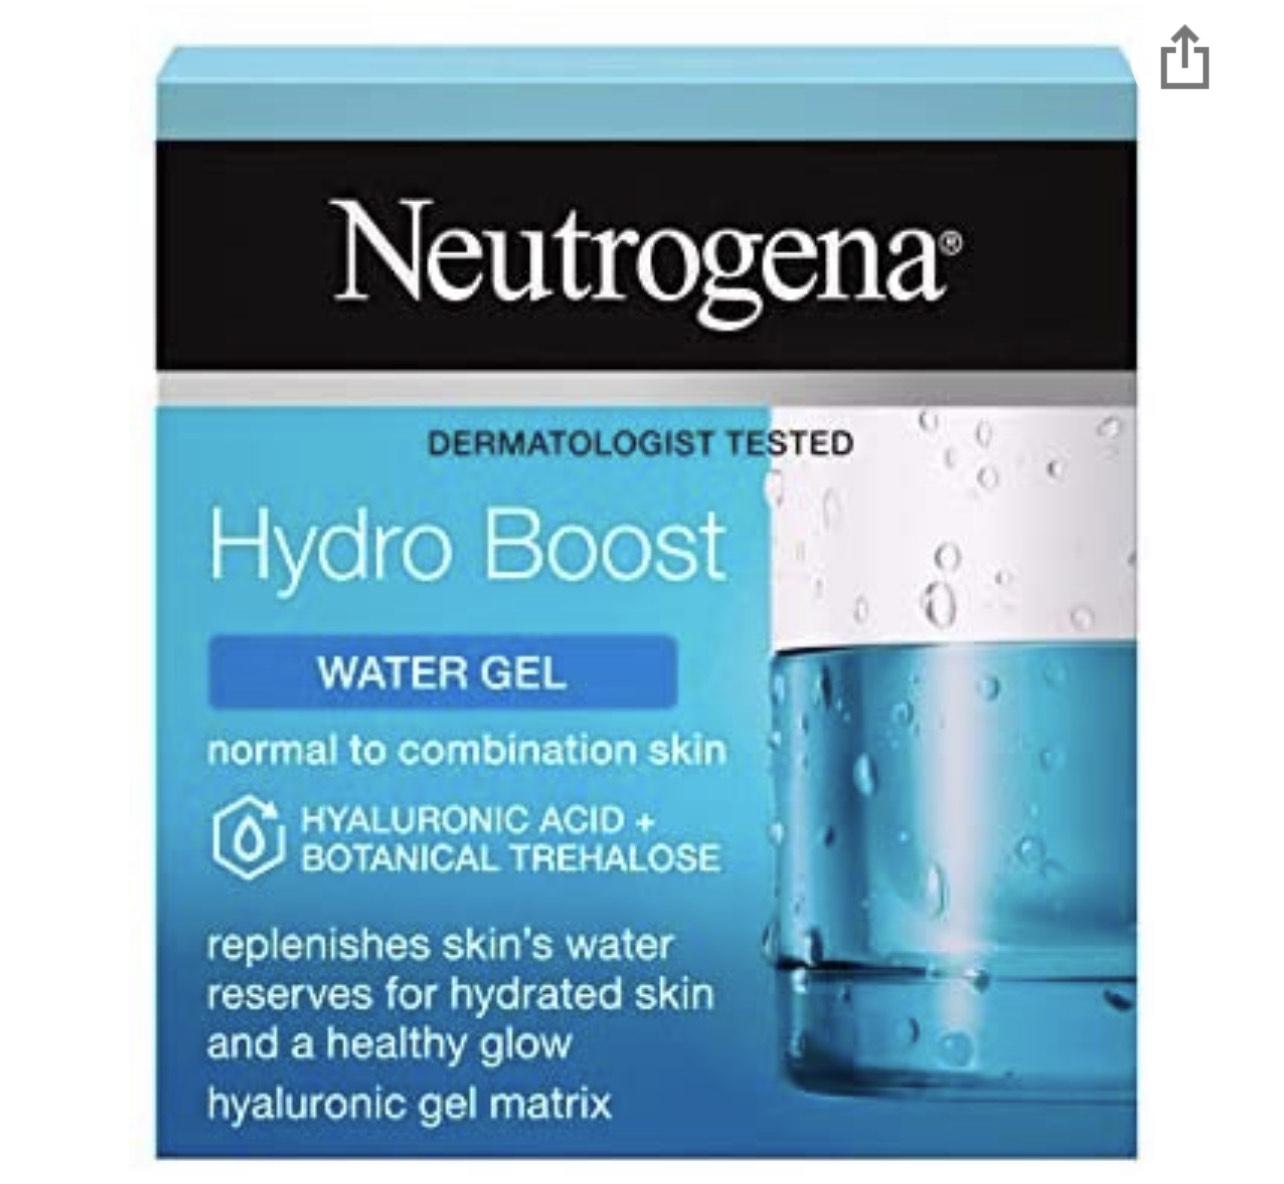 Neutrogena Hydro Boost Water Gel Moisturiser with Hyaluronic Acid & Trehalose £6.50 (Prime Exclusive) @ Amazon